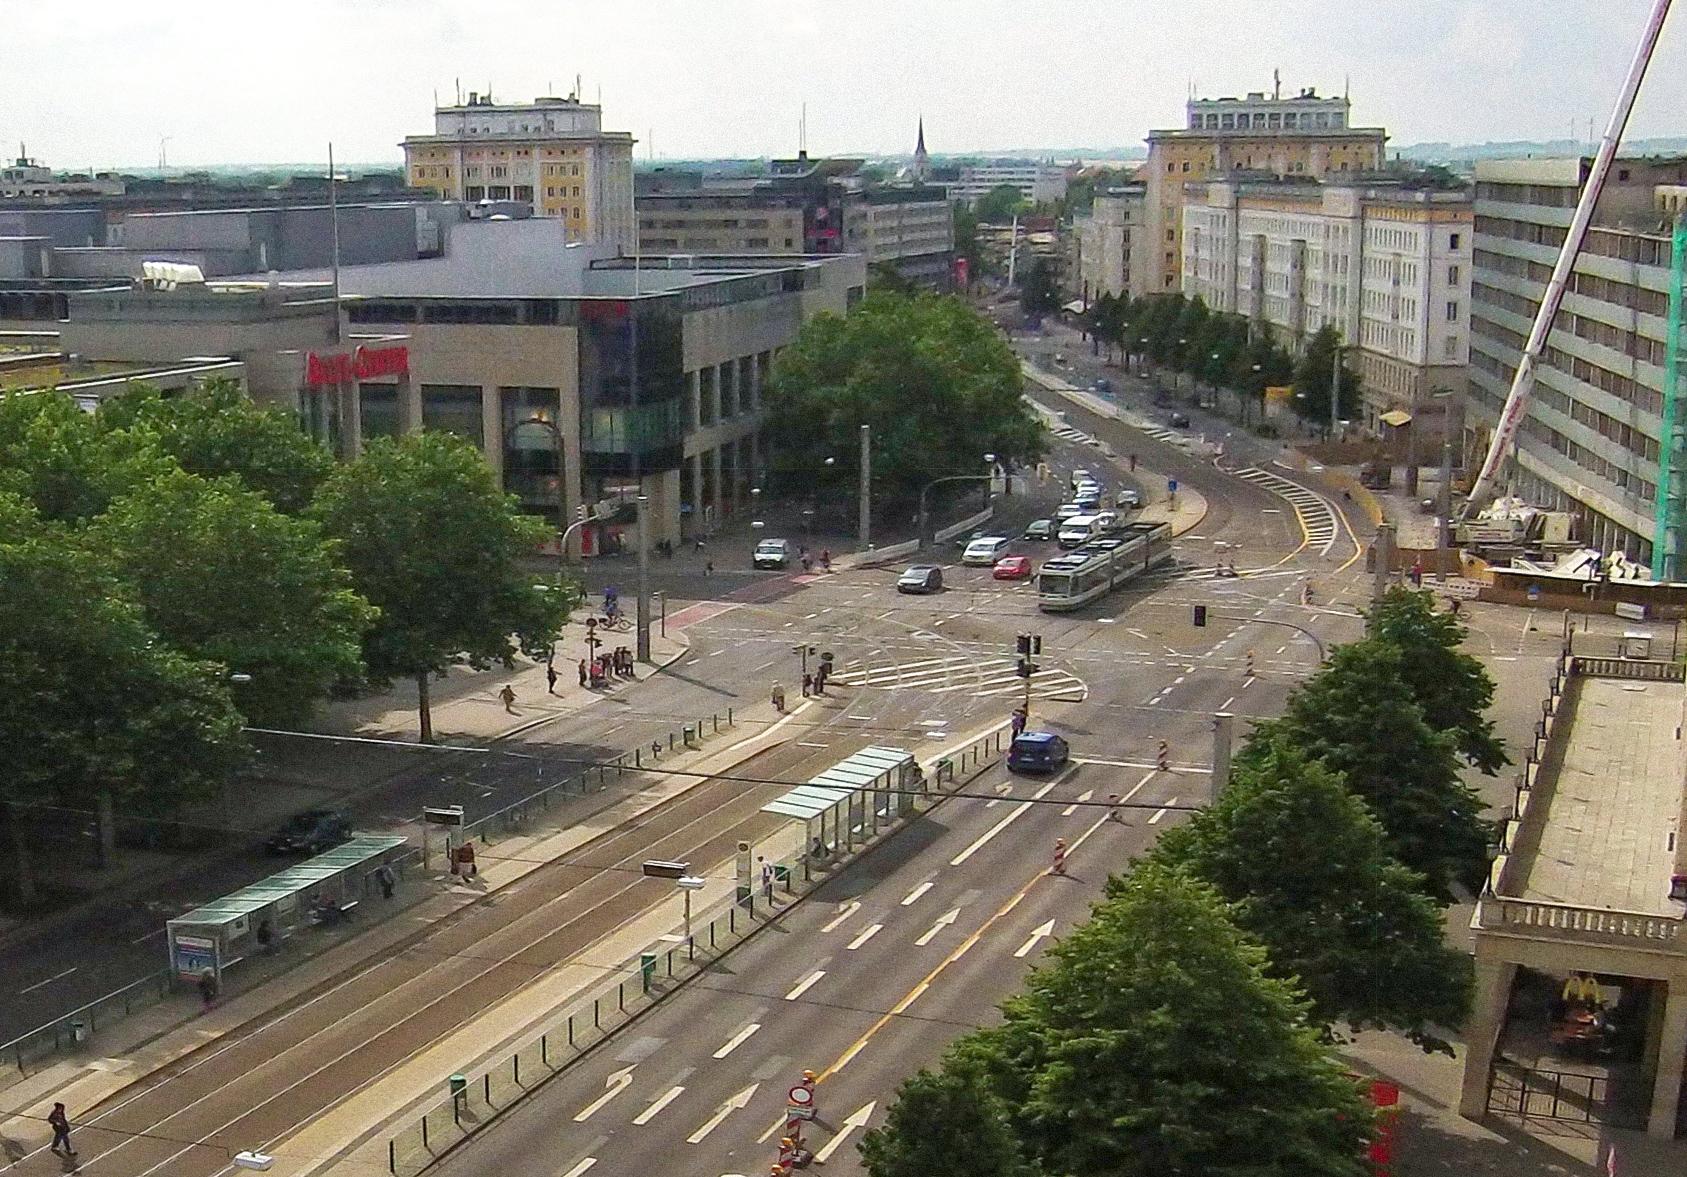 Zentraler_Platz2_Zeitreisen_Magdeburg_Neu